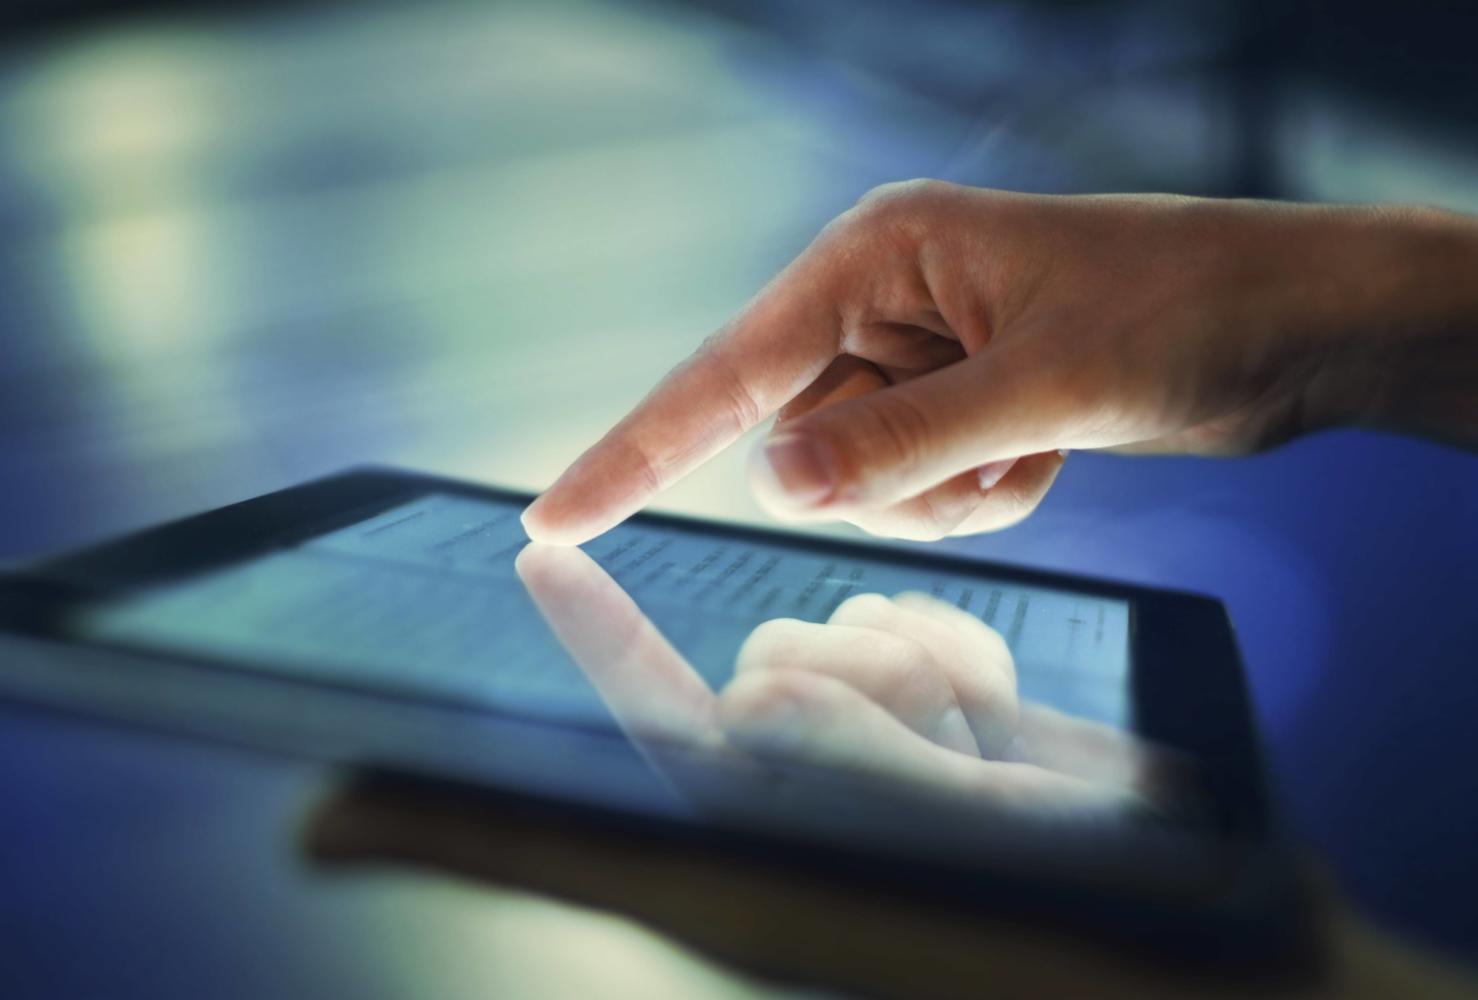 Finger touching tablet screen